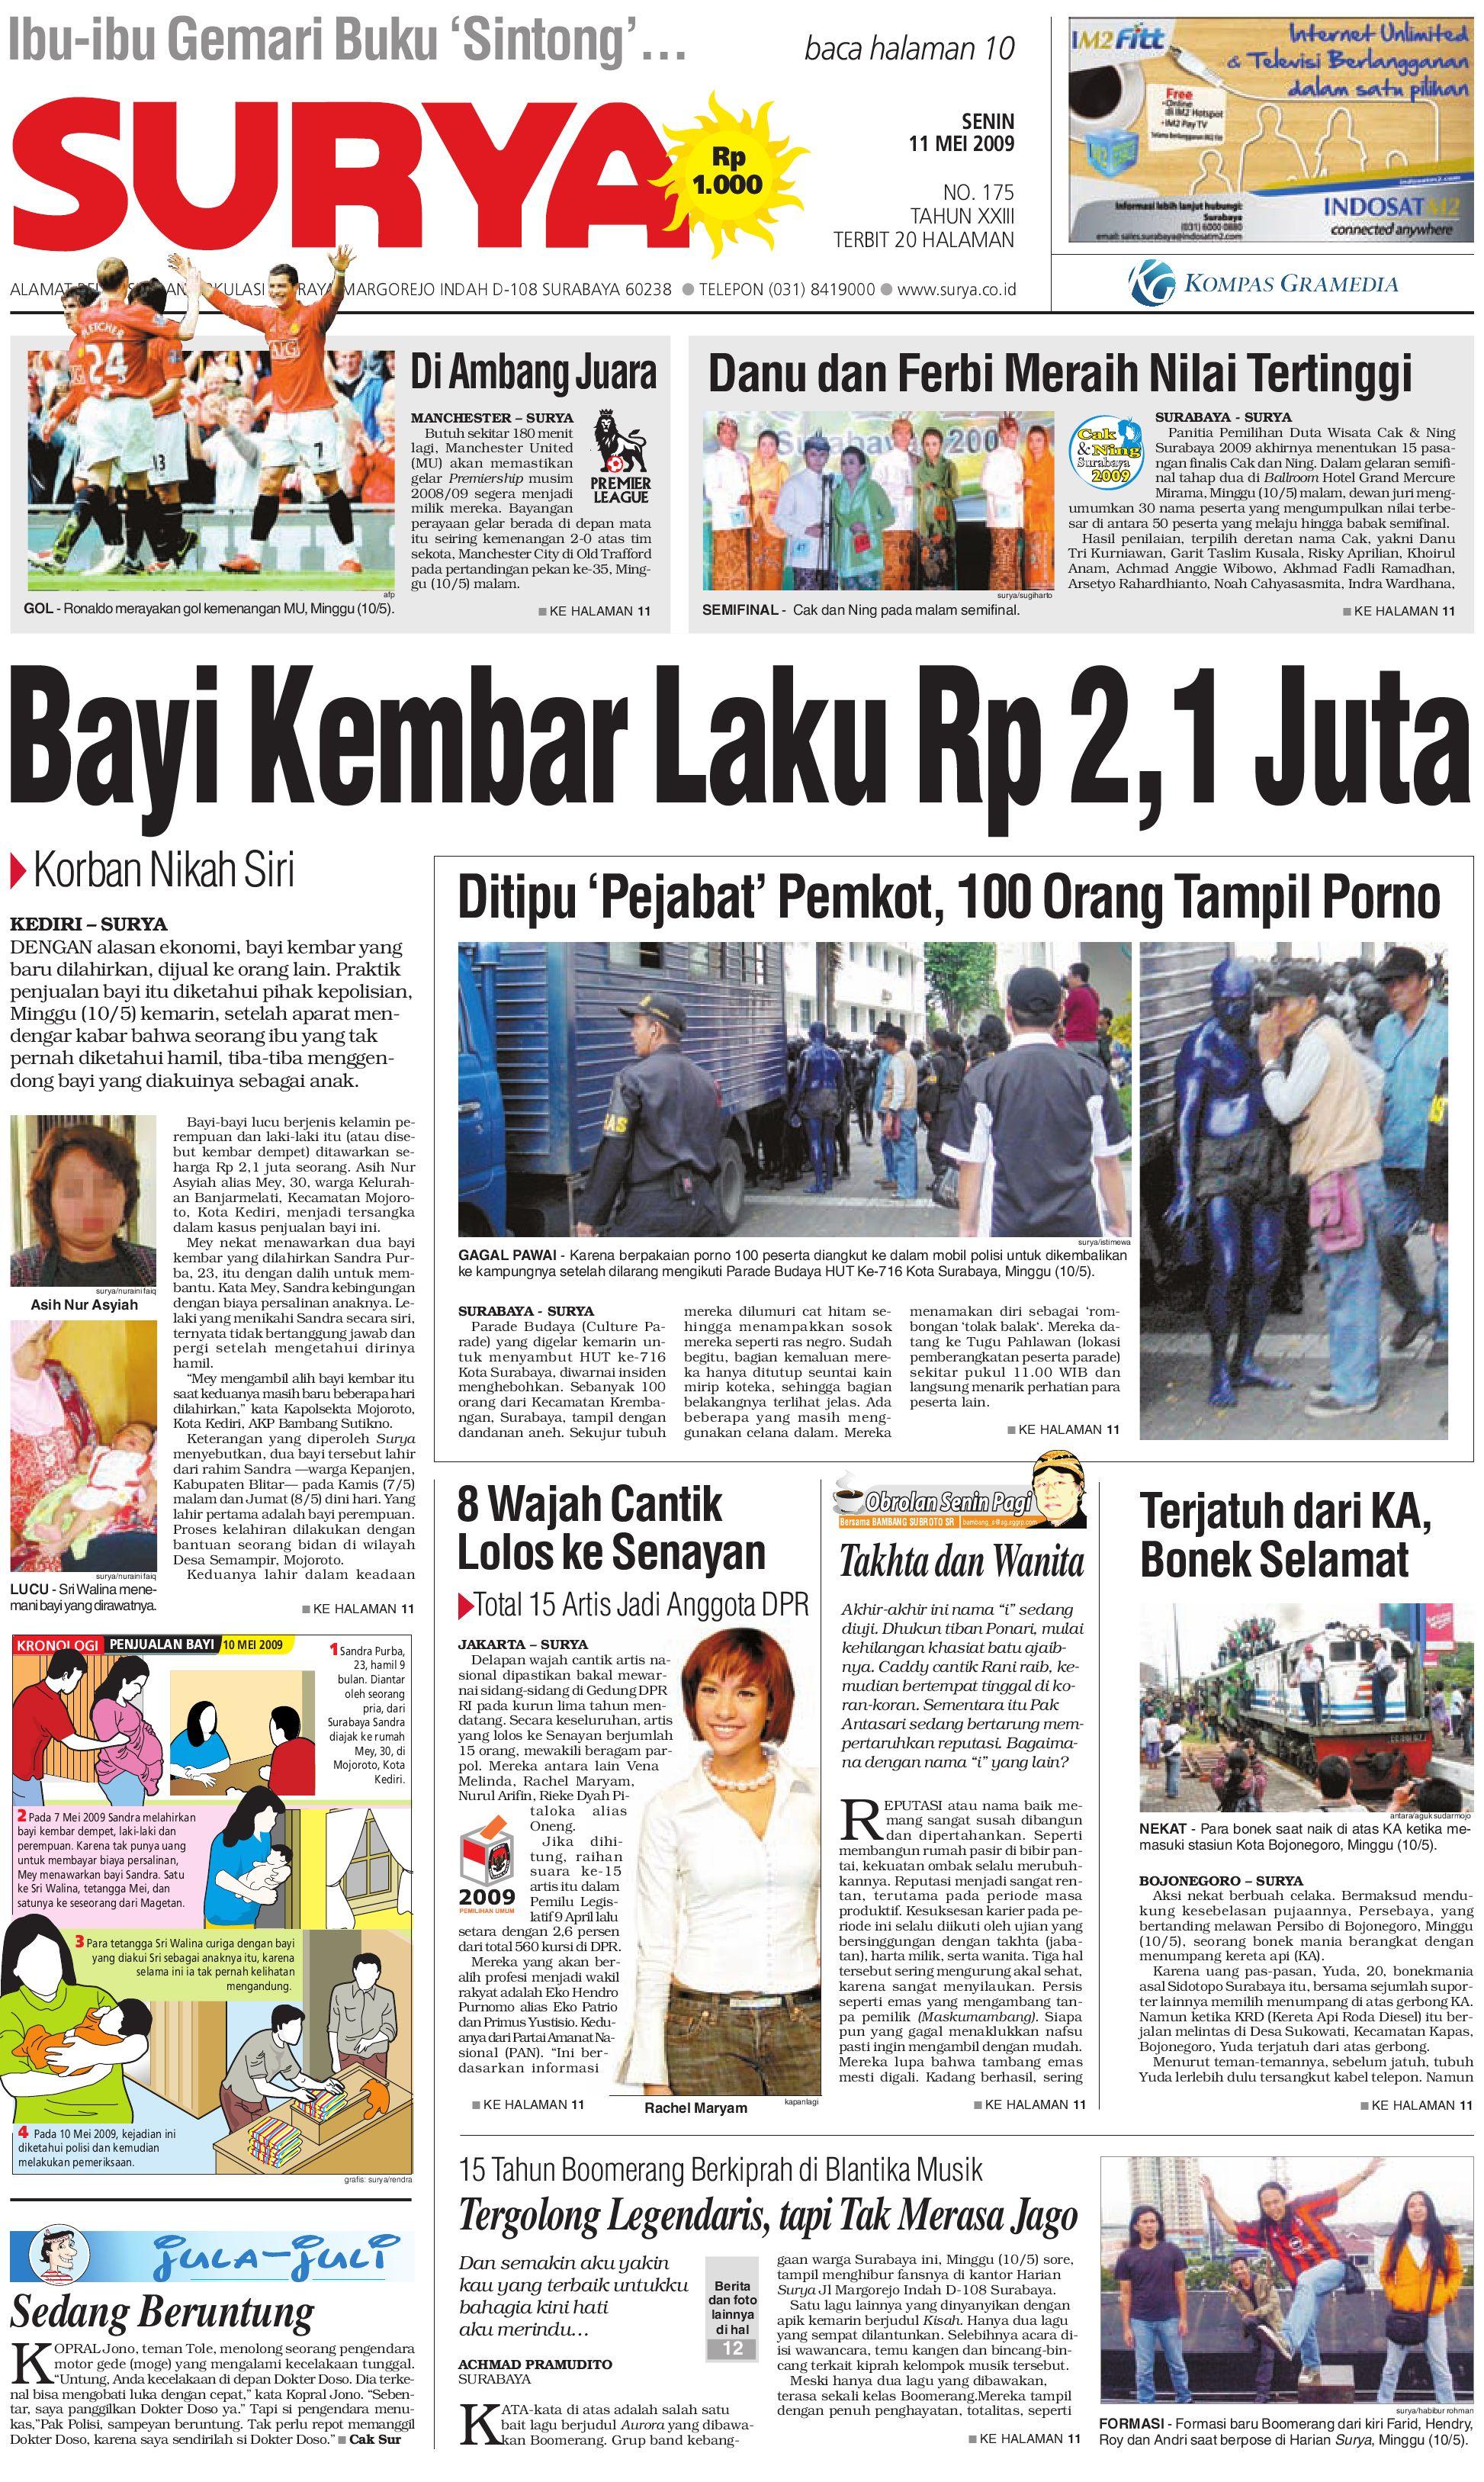 Surya Edisi Cetak 11 Mei 2009 by Harian SURYA - issuu